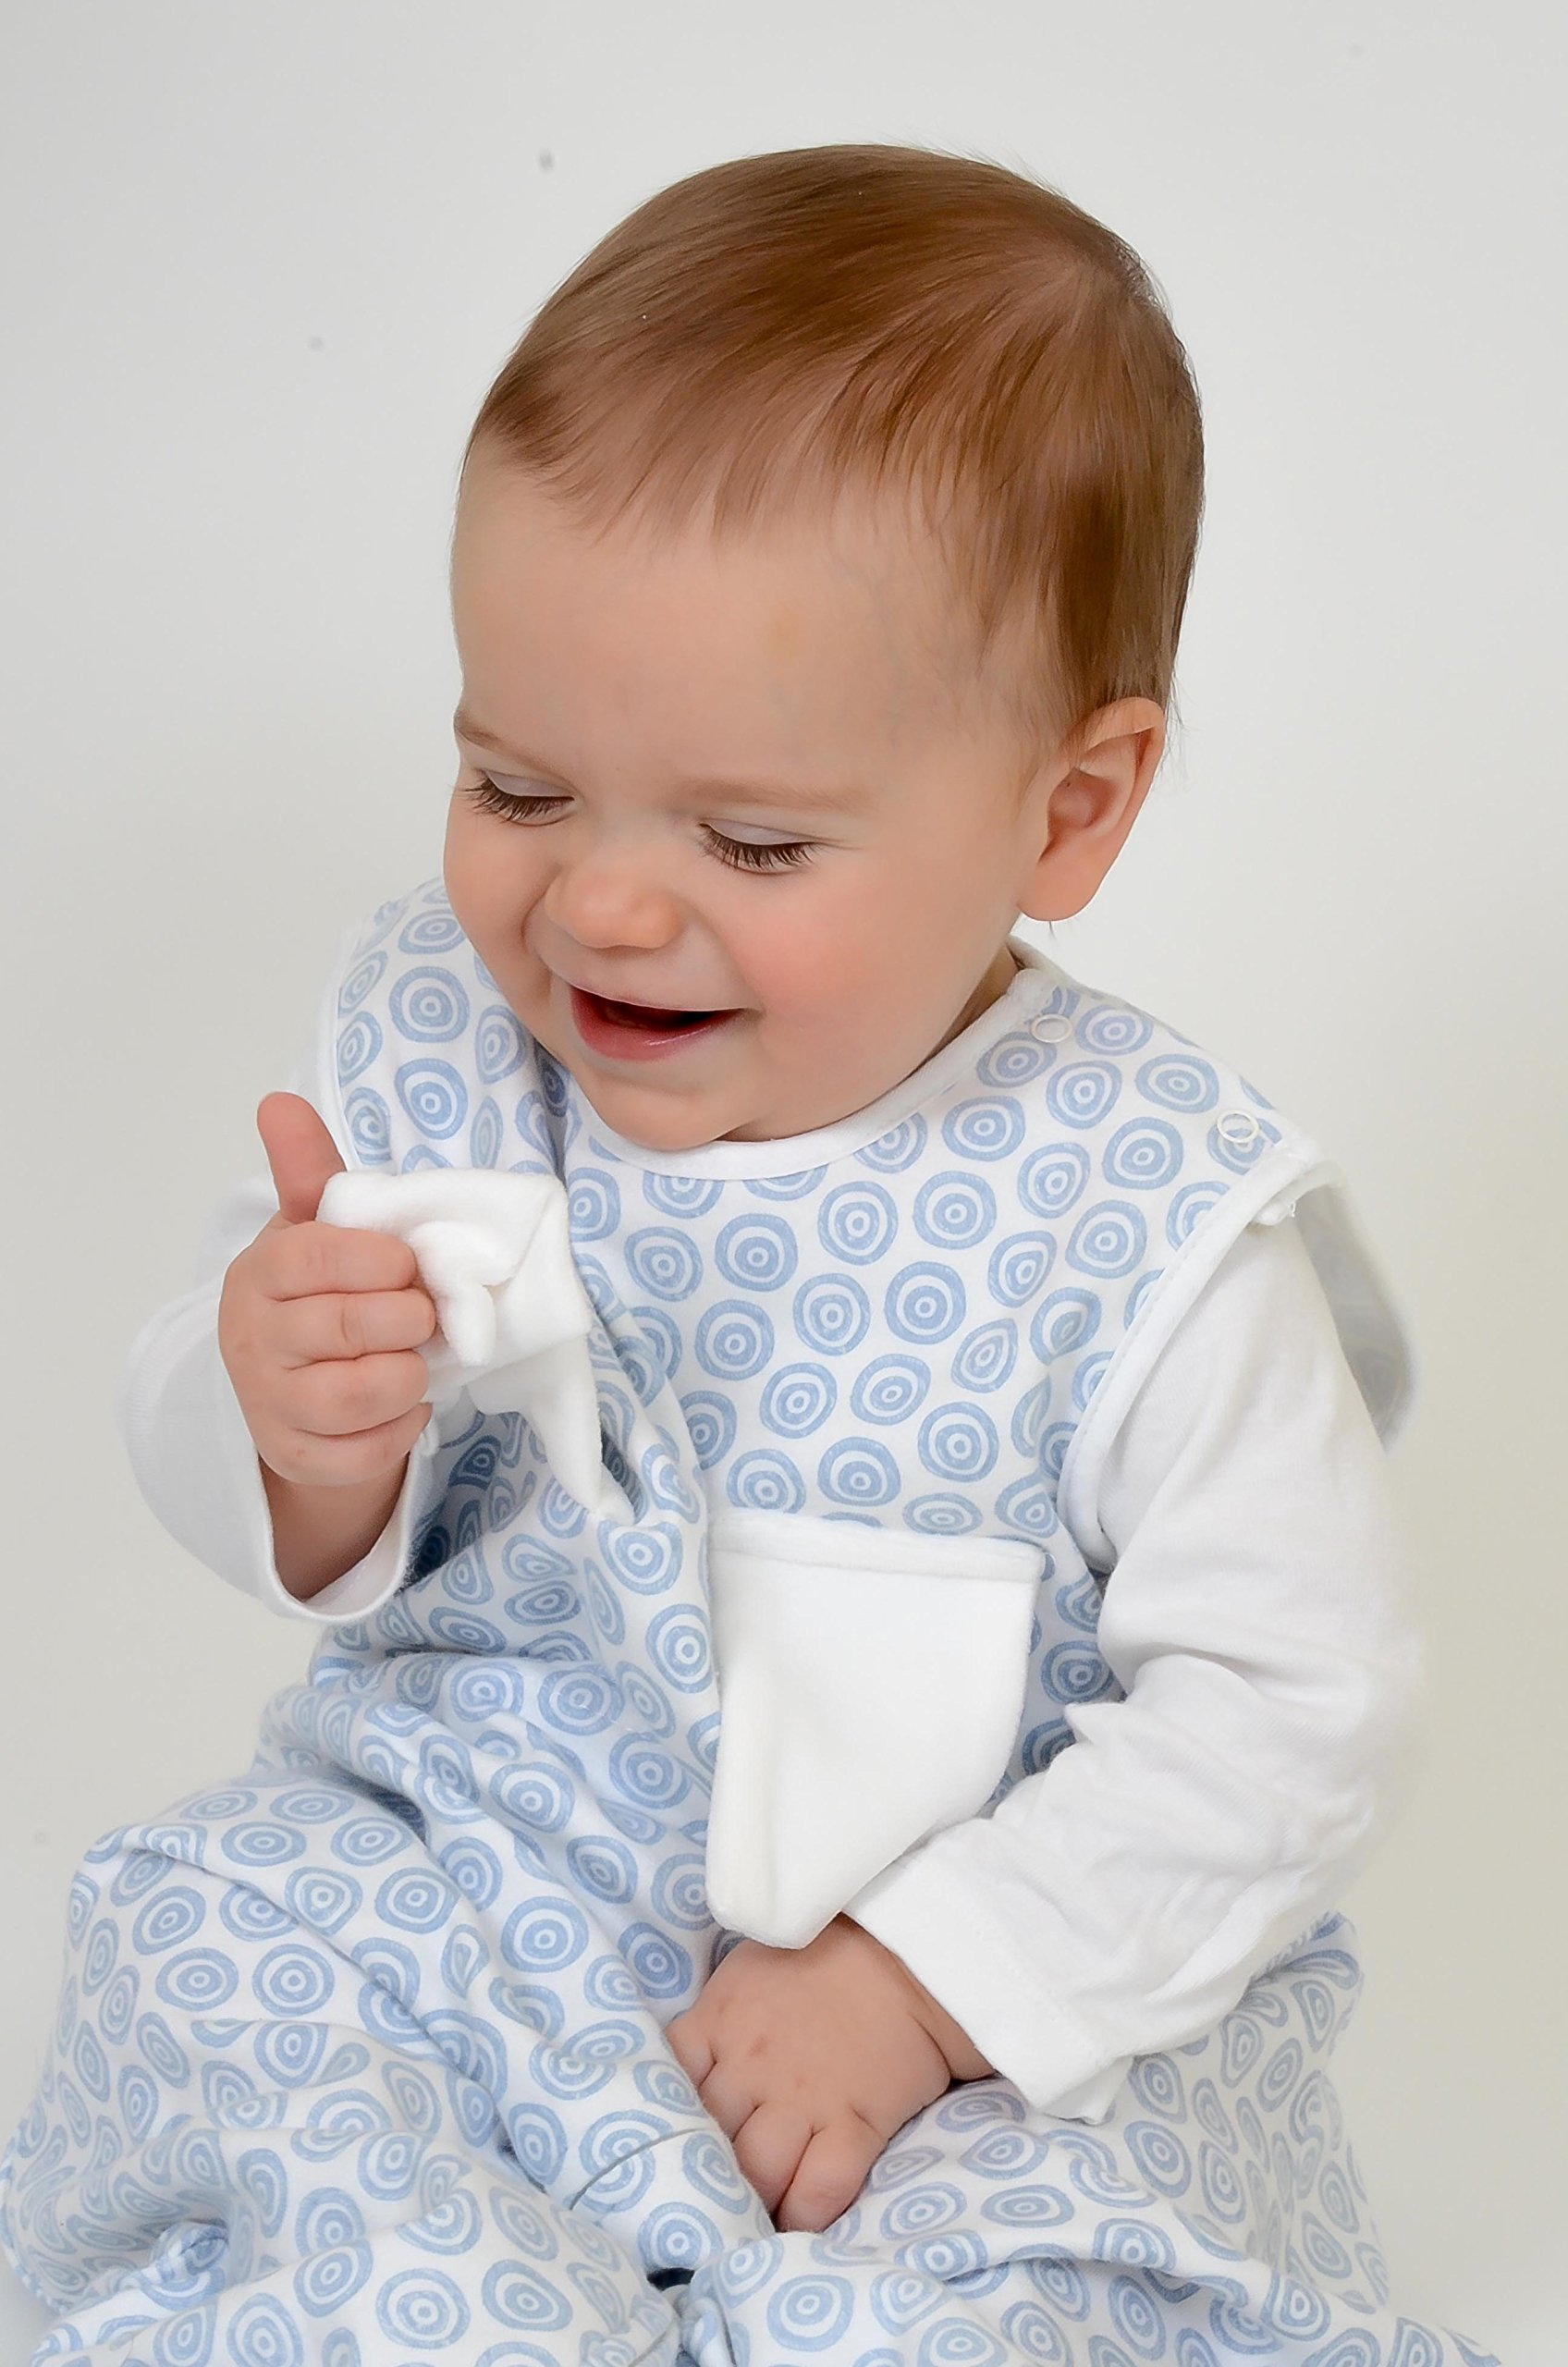 Bitta Kidda Baby Soother Sleeping Bag Wearable Blanket + Lovey - Blue Circles 3M